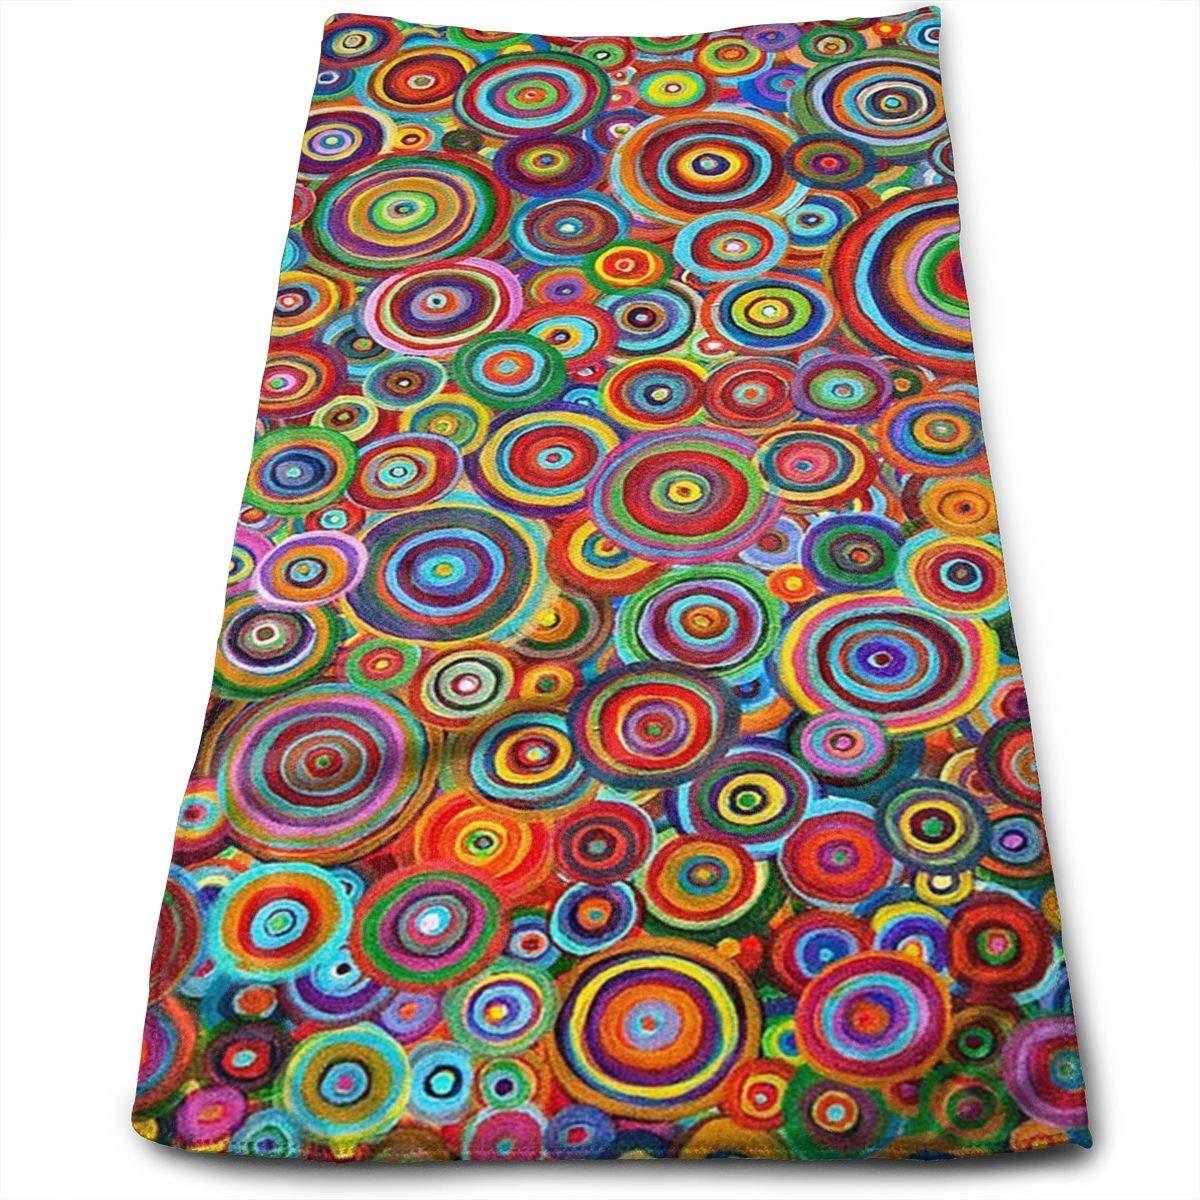 Psychedelic Ultra Oquycz Art Microfiber Candle Towels Trippy Soft LSpUVjGqzM